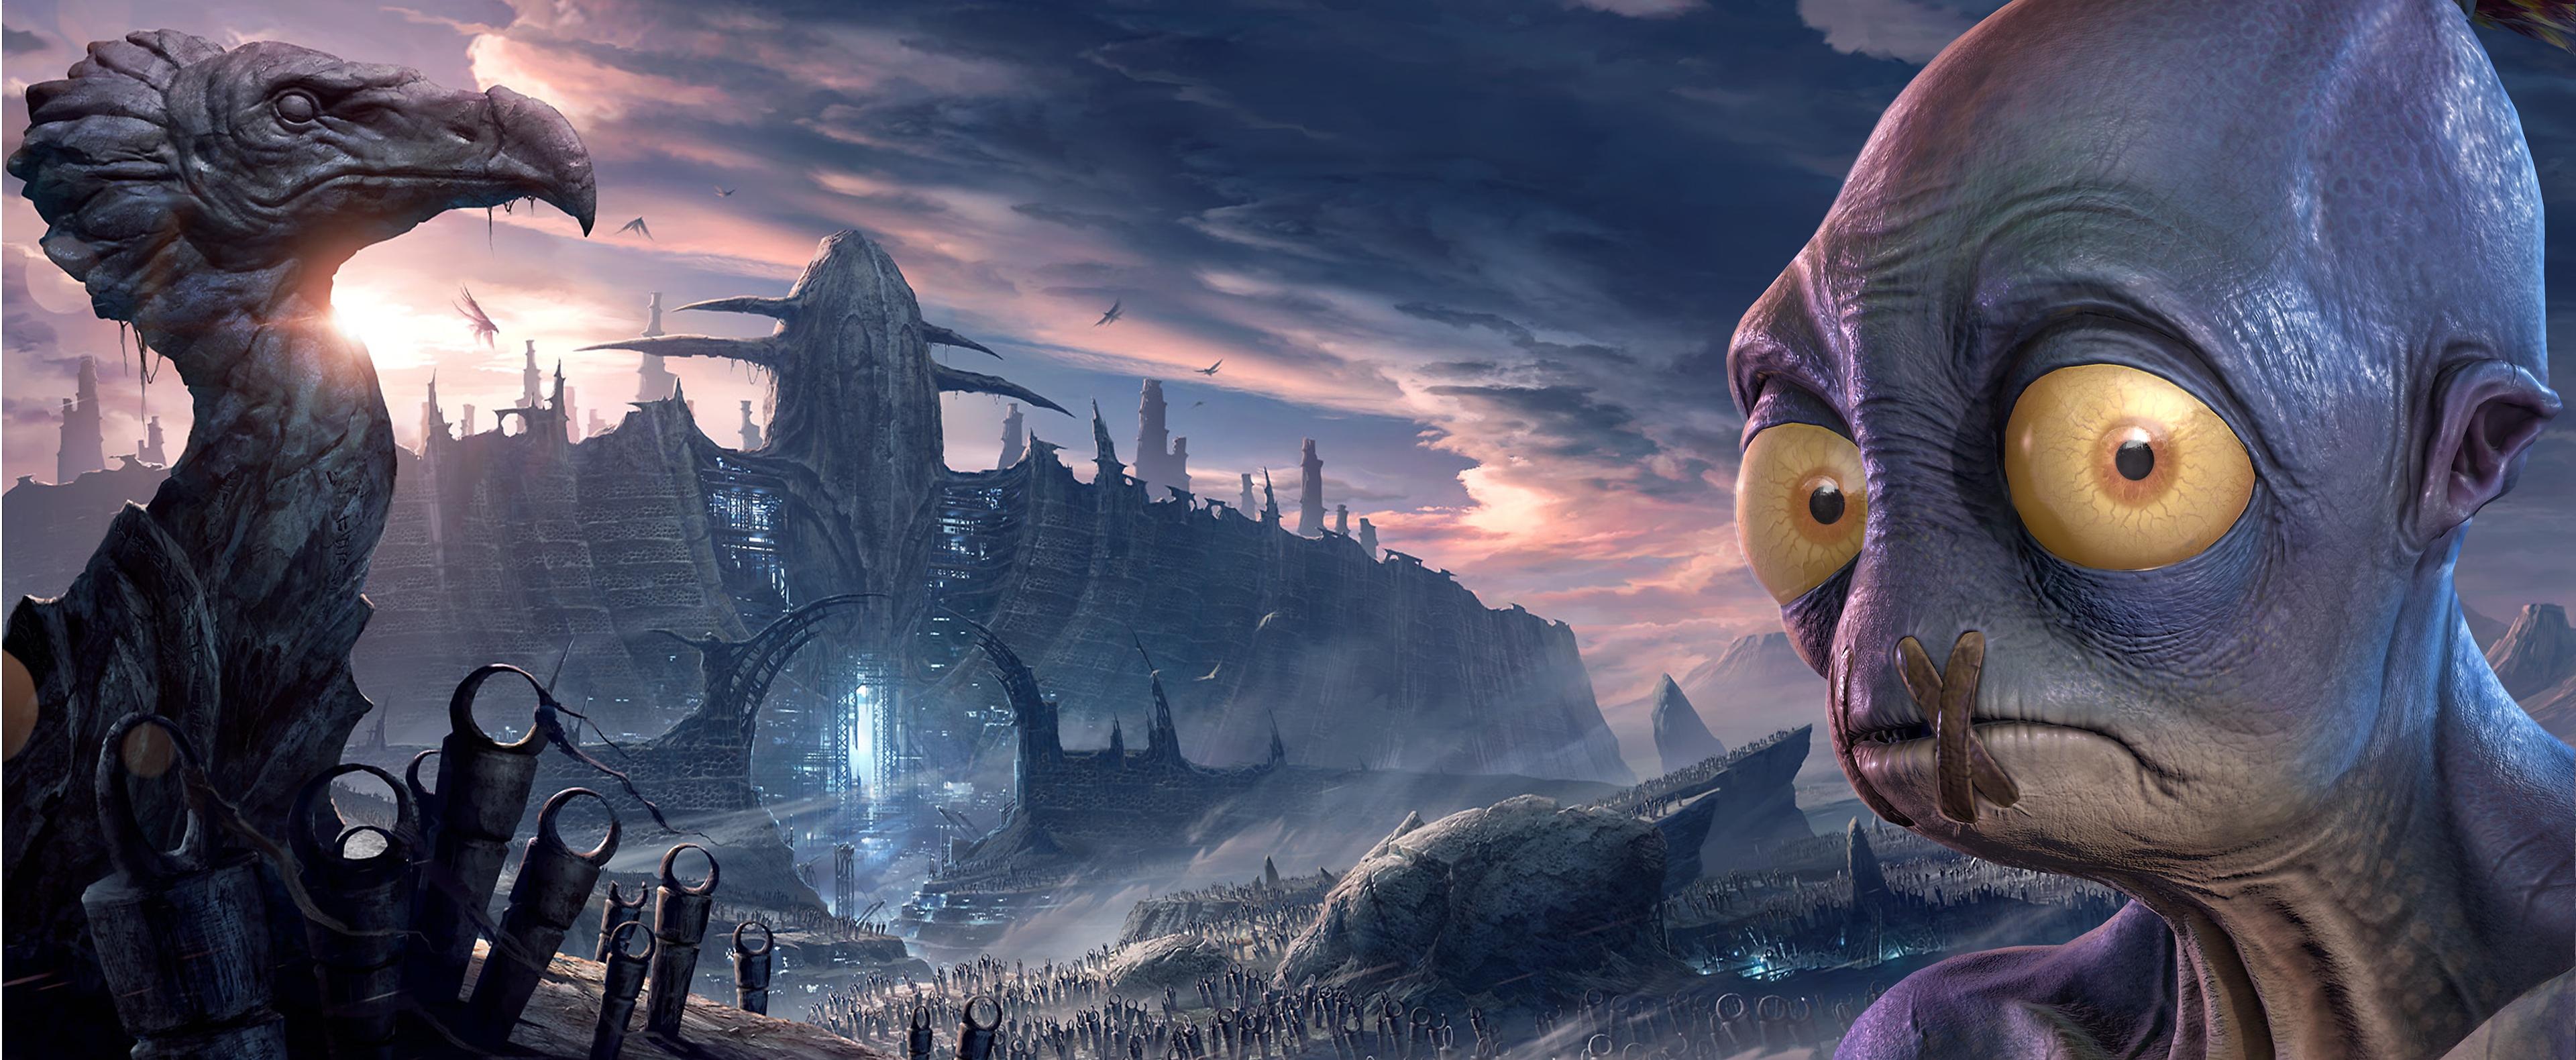 Oddworld Soulstorm - คีย์อาร์ต